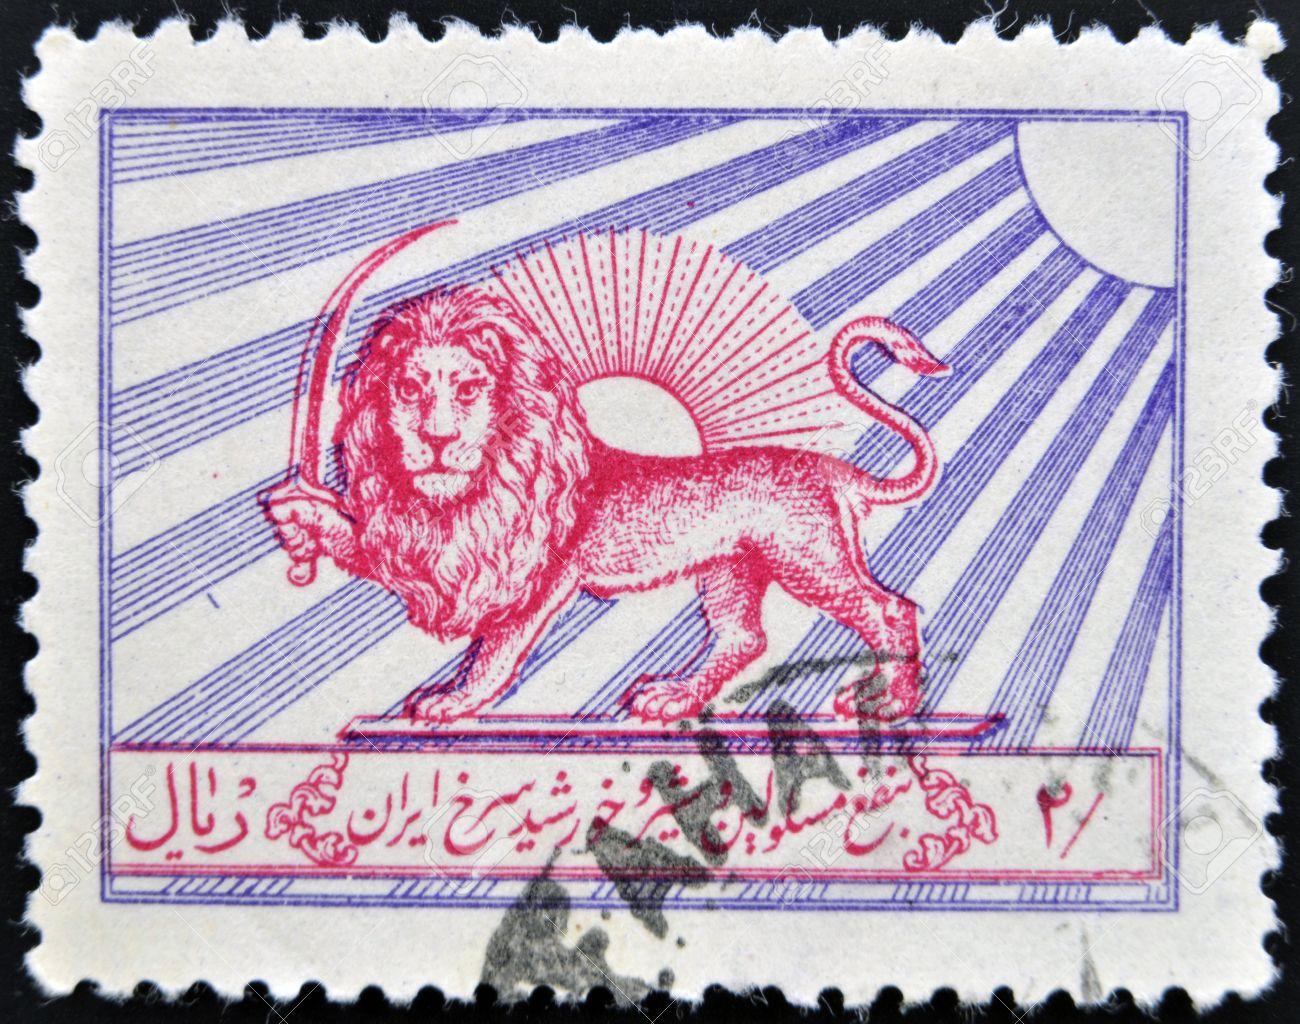 IRAN - CIRCA 1976: A stamp printed in Iran shows Red Lion and Sun Society, circa 1976 Stock Photo - 13749299